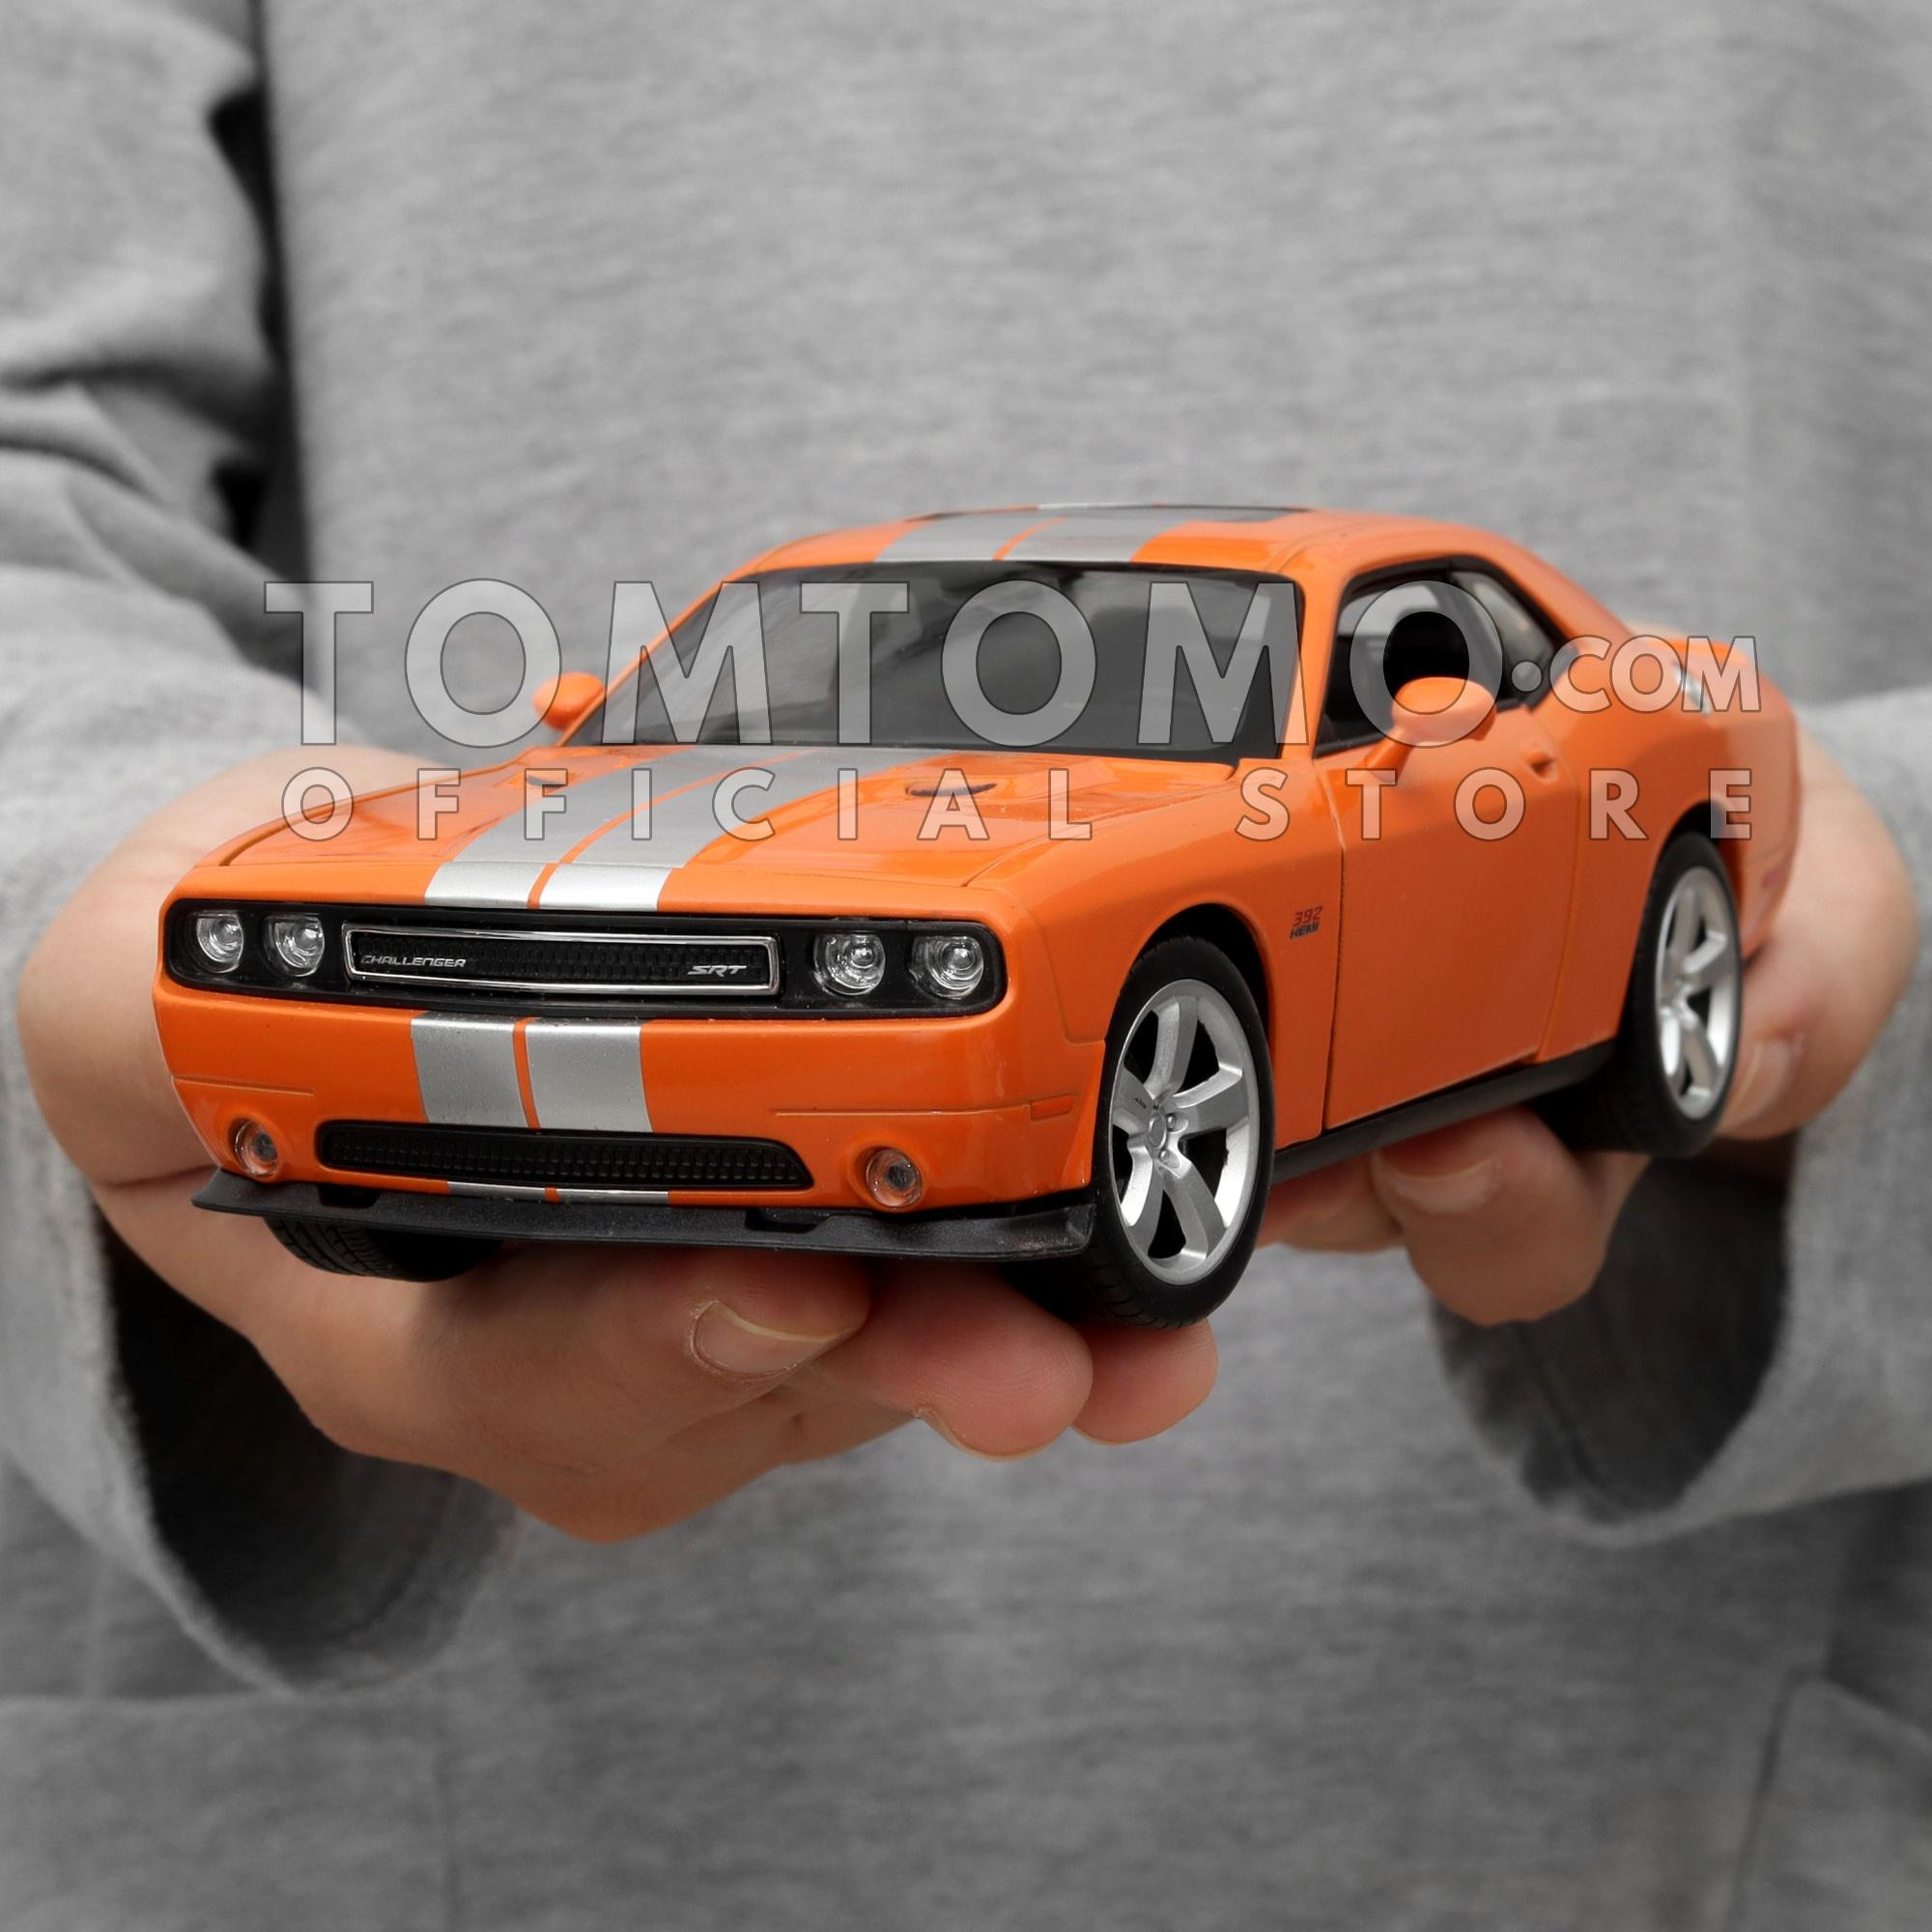 ... TOMINDO Source · View Mercedes Benz Sls Amg L Tomtomo Diecast Miniatur Mobil Mobilan